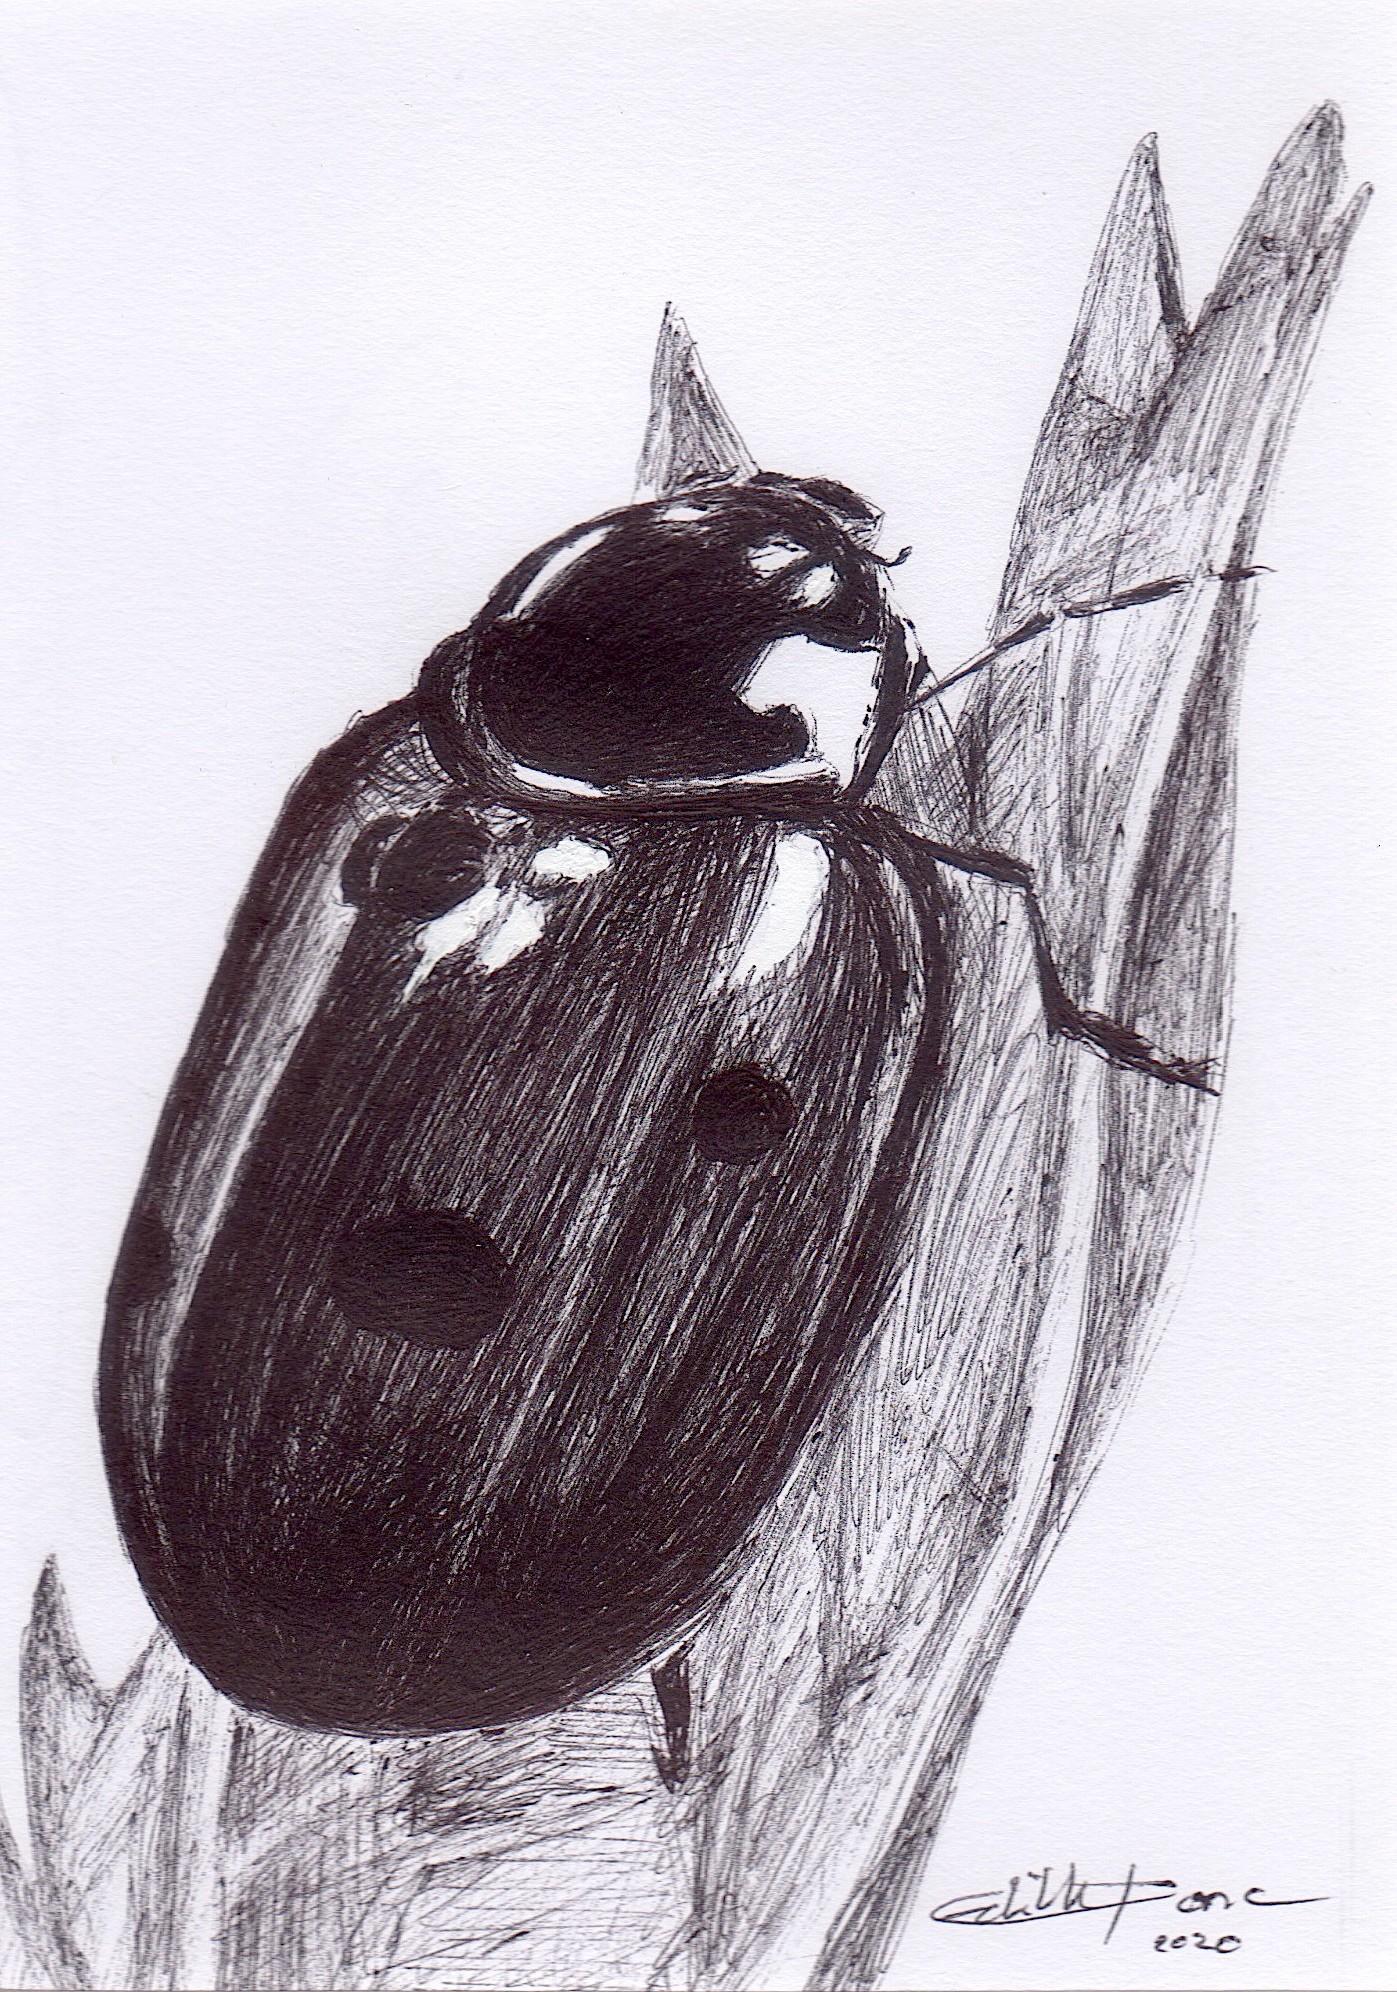 Edith Donc - Coccinella Septempunctata